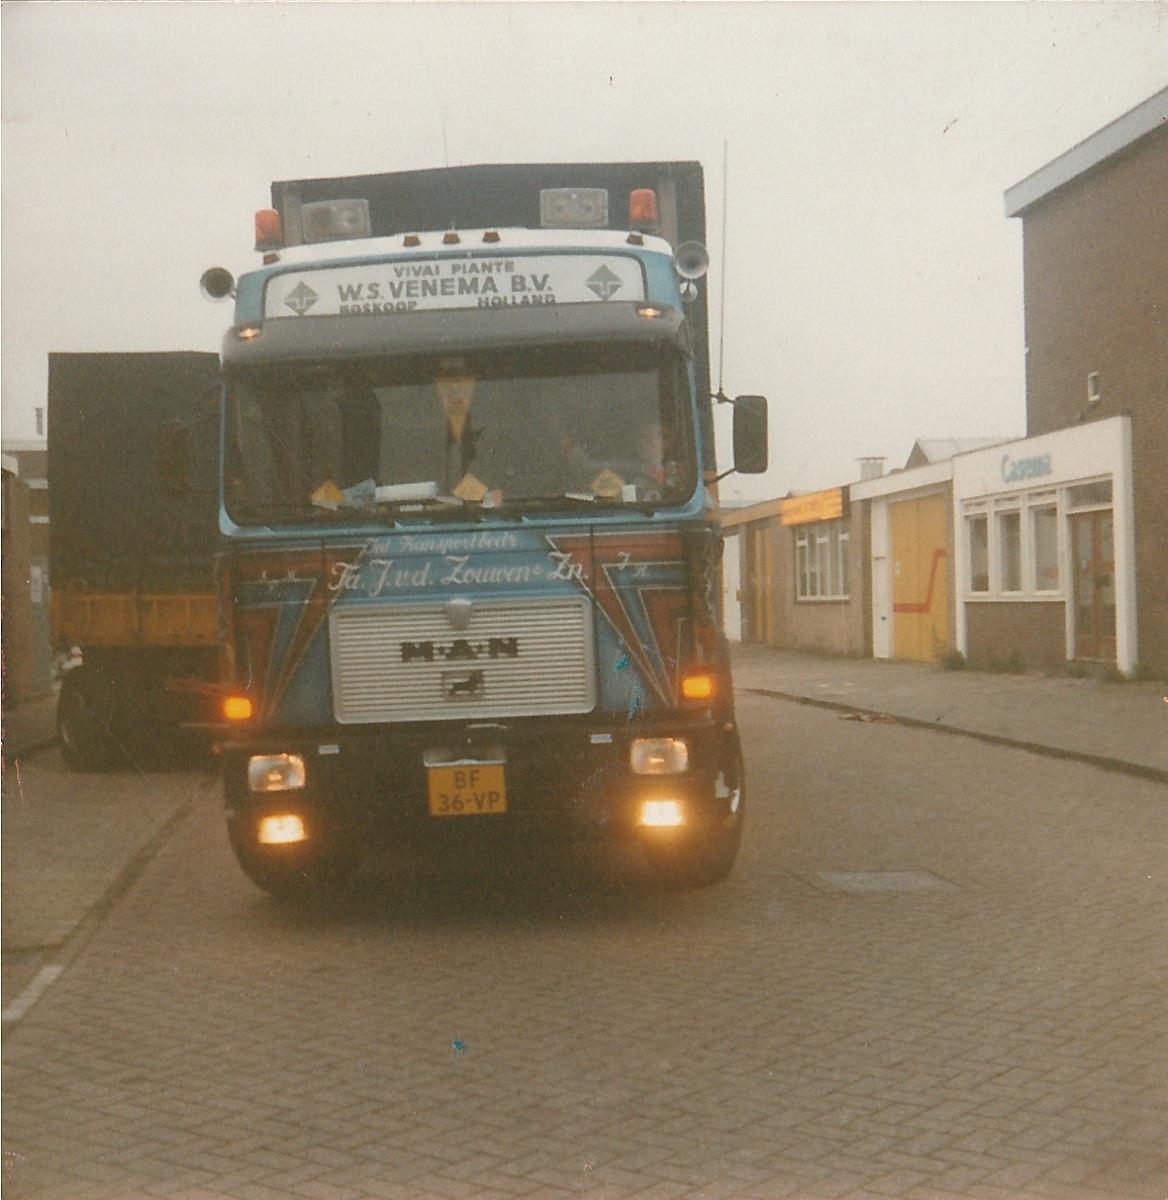 MAN-in-Utrecht